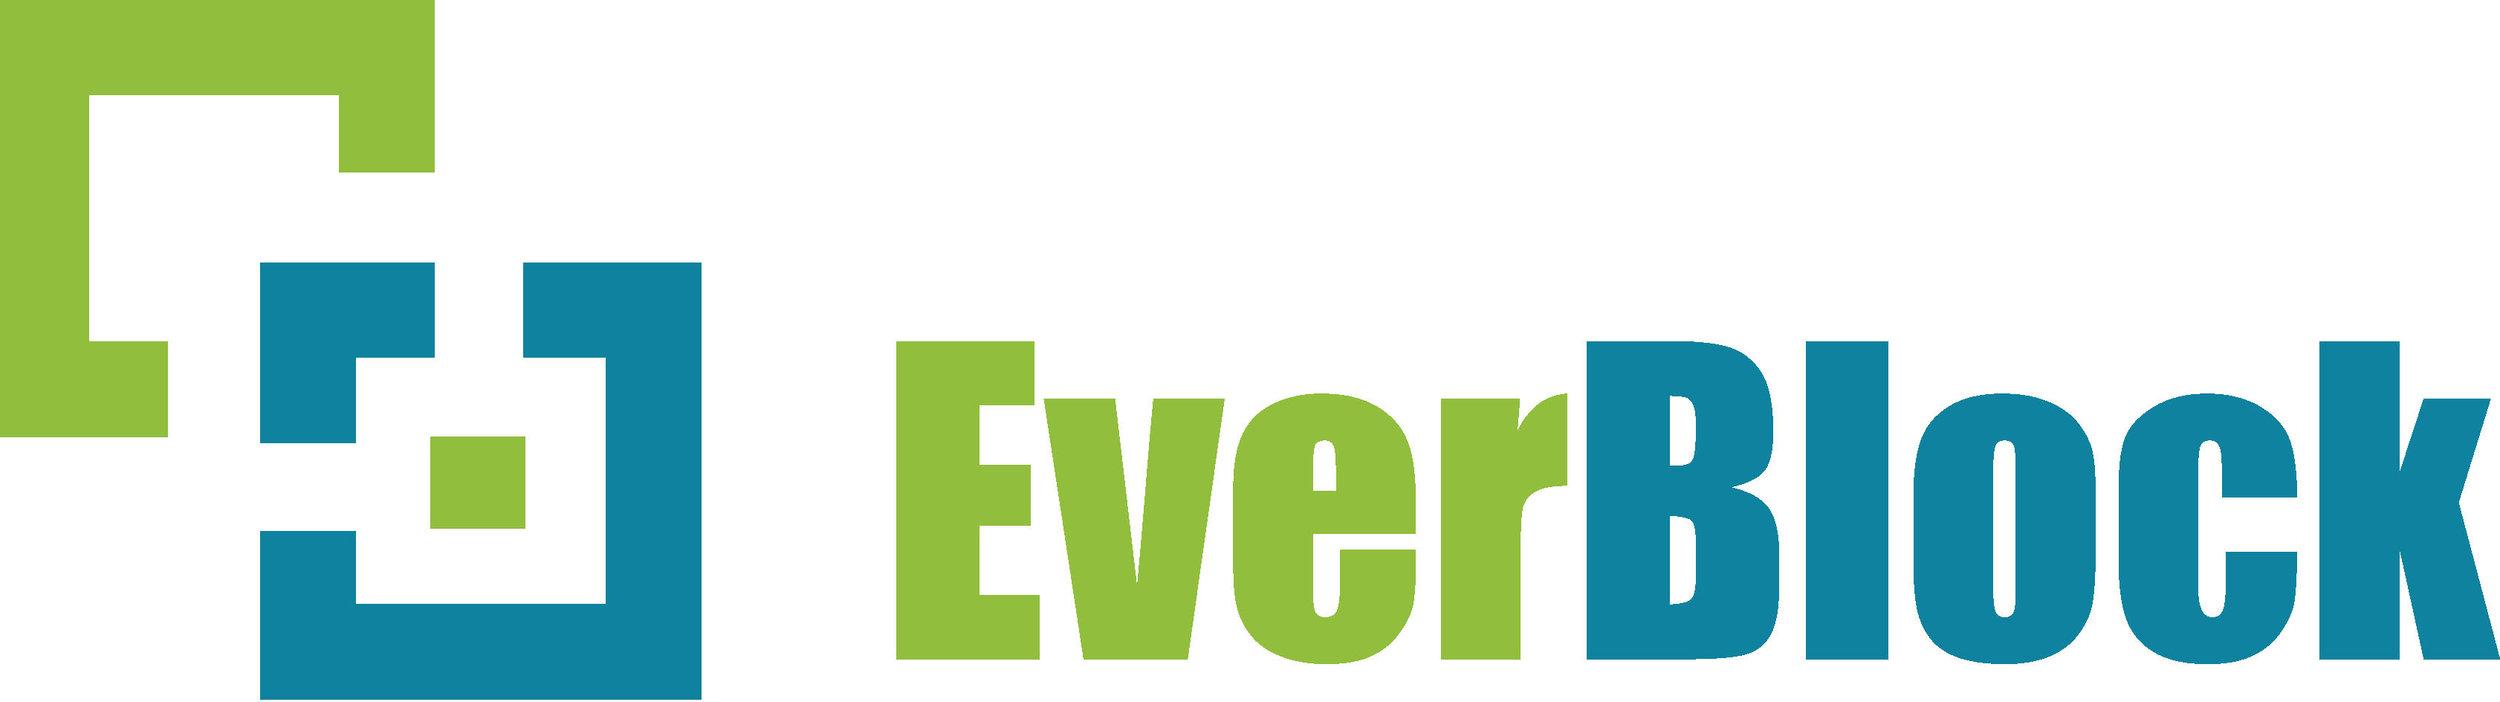 EverBlock Logo multi-color.jpg